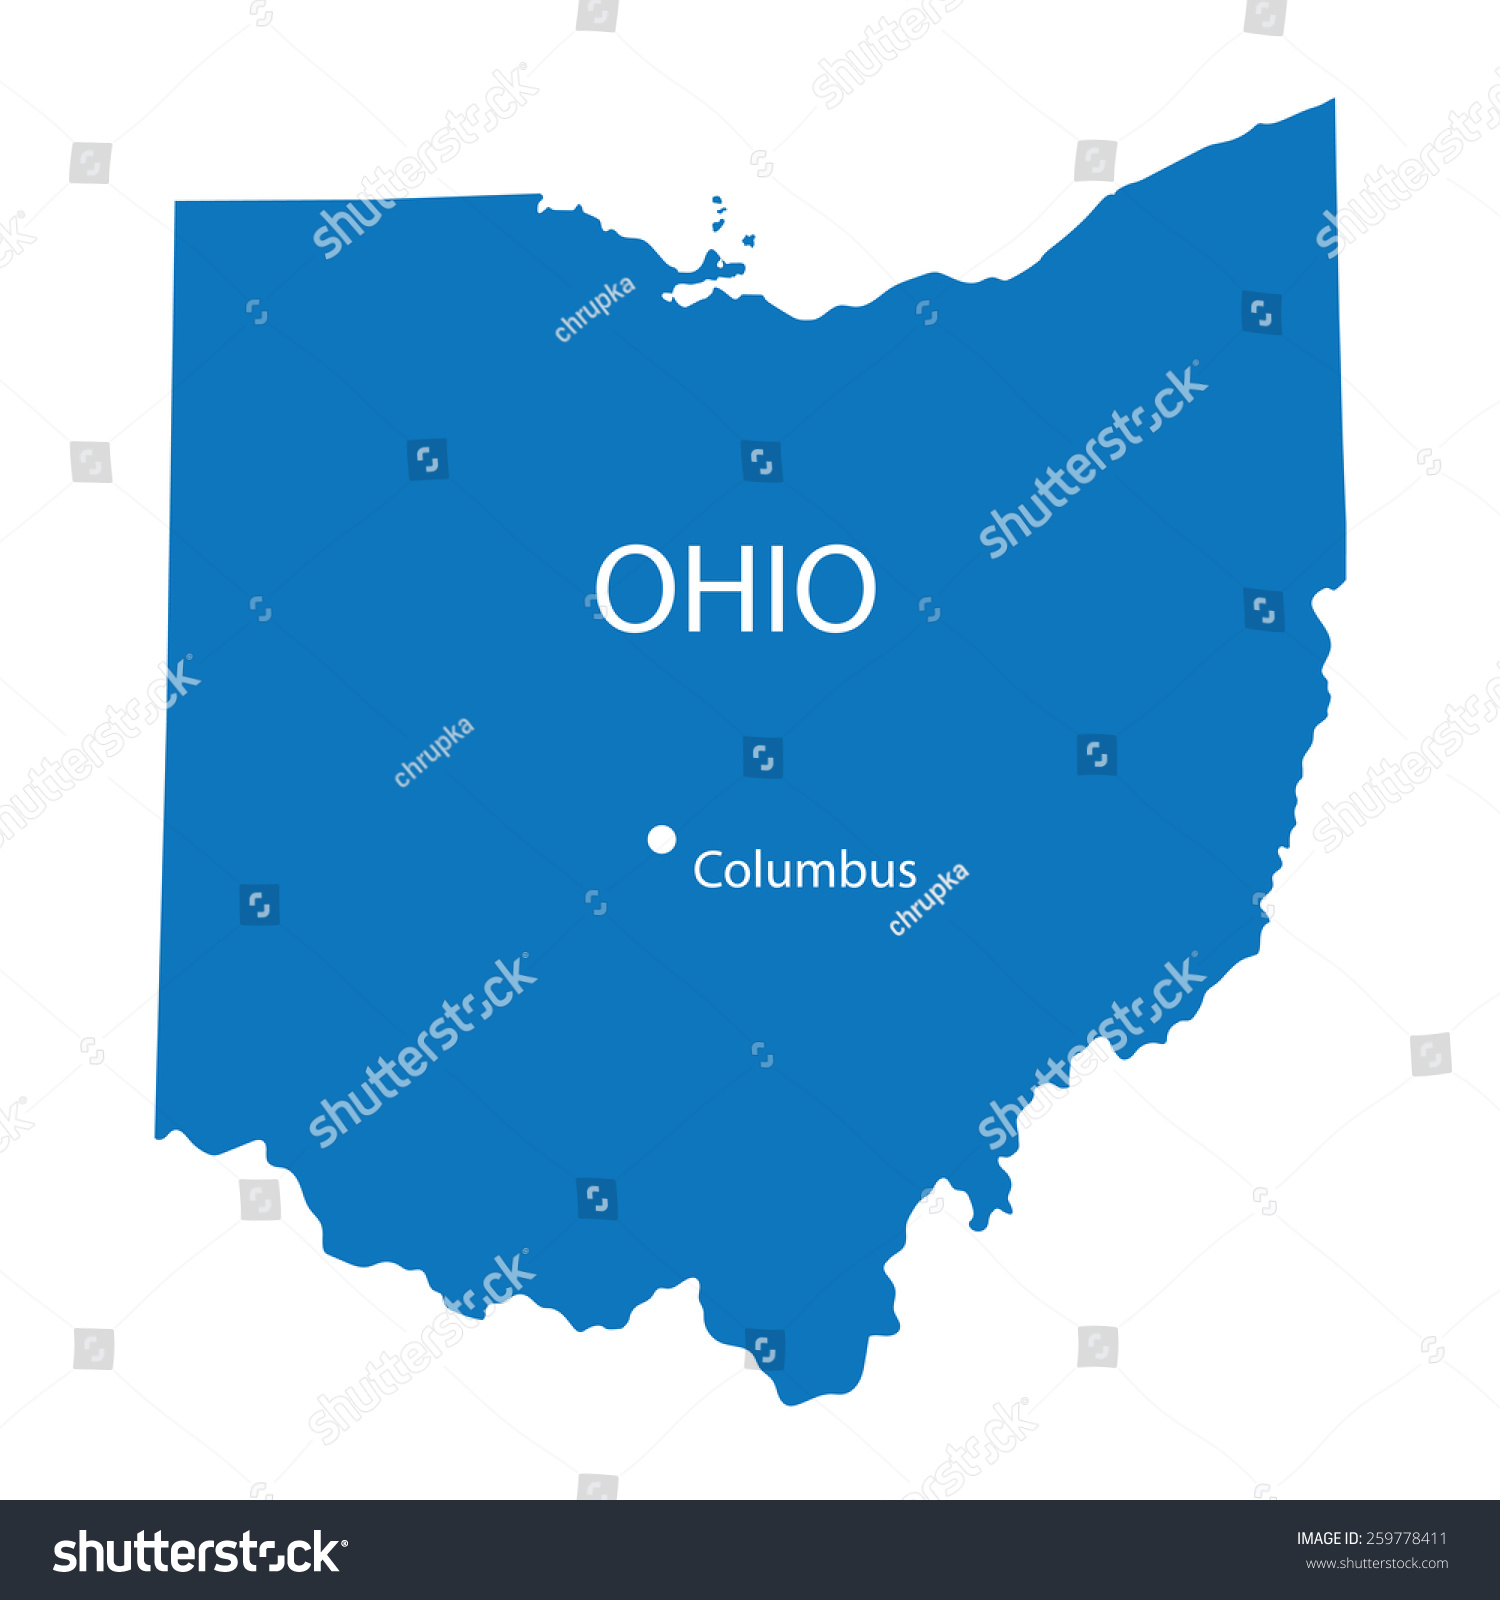 Google Maps Columbus Ohio Parking Nyc Map - Columbus maps google